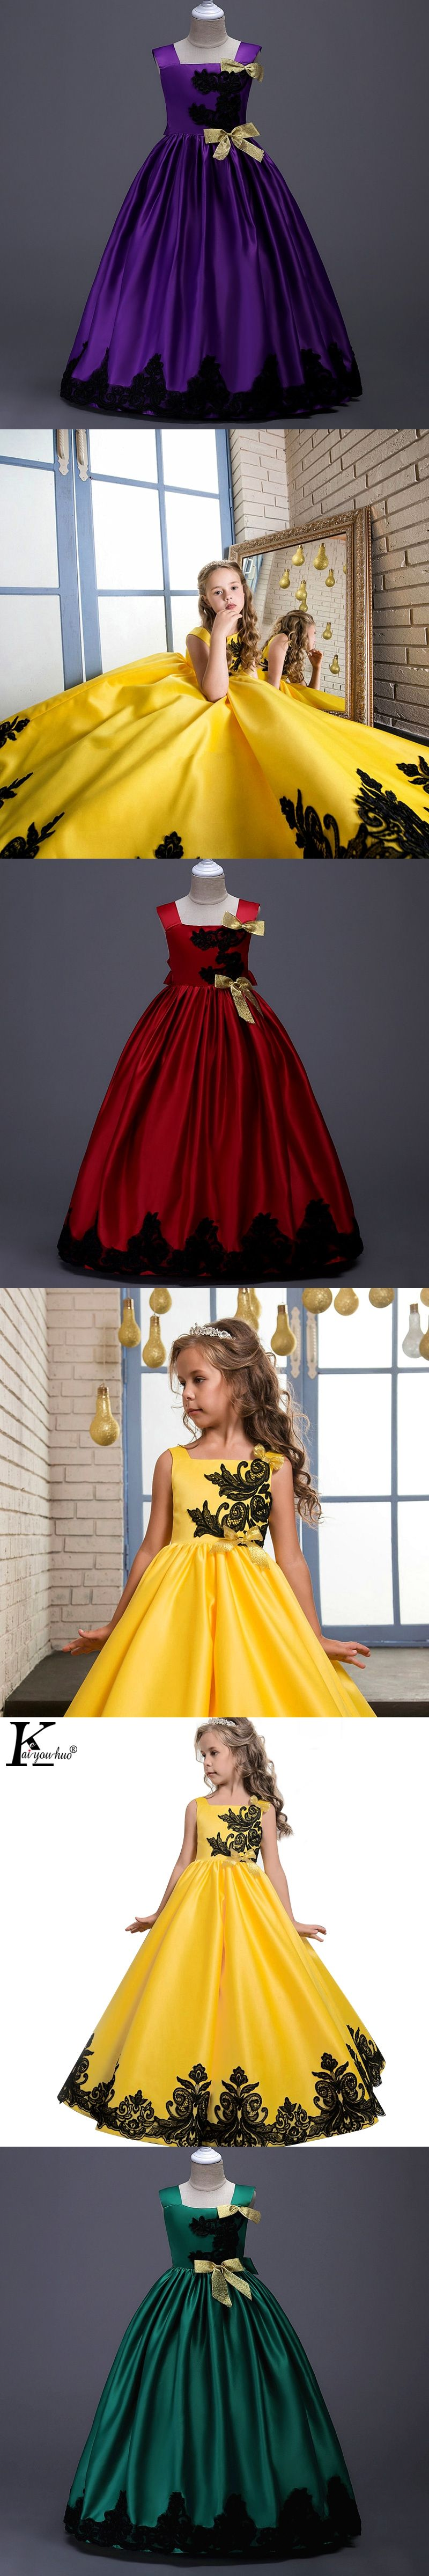 girls dress carnava kids dresses for girls clothes teenagers